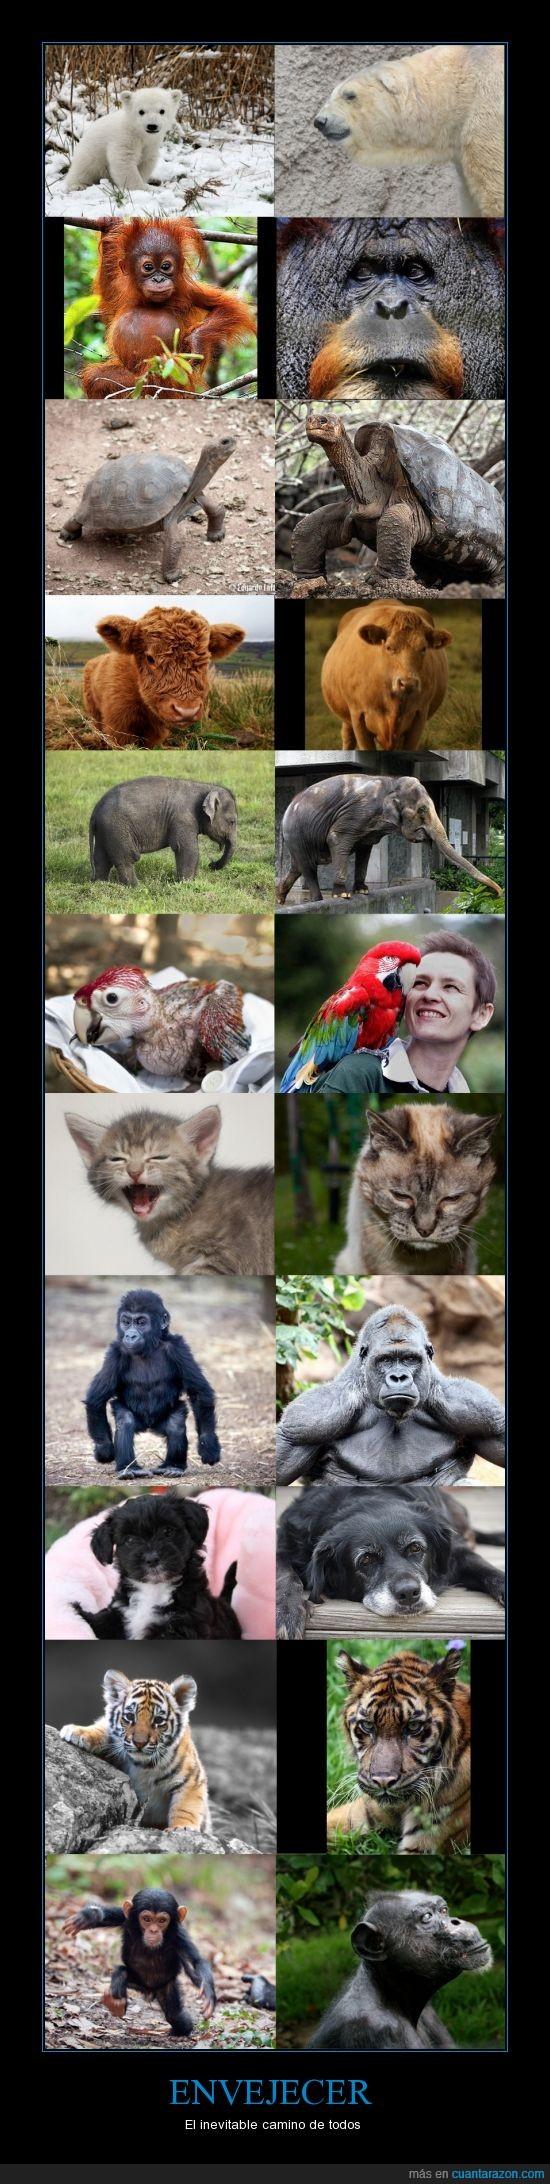 animal,Arturo,bebe,chimpance,cria,Elefante,galapagos,gato,George,gorilla,Gregorie,guacamaya,Guy,Hanako,Melani,orangutan,oso,Pancho,papagaya,perro,polar,Siam,tigre,Tortuga,Vaca